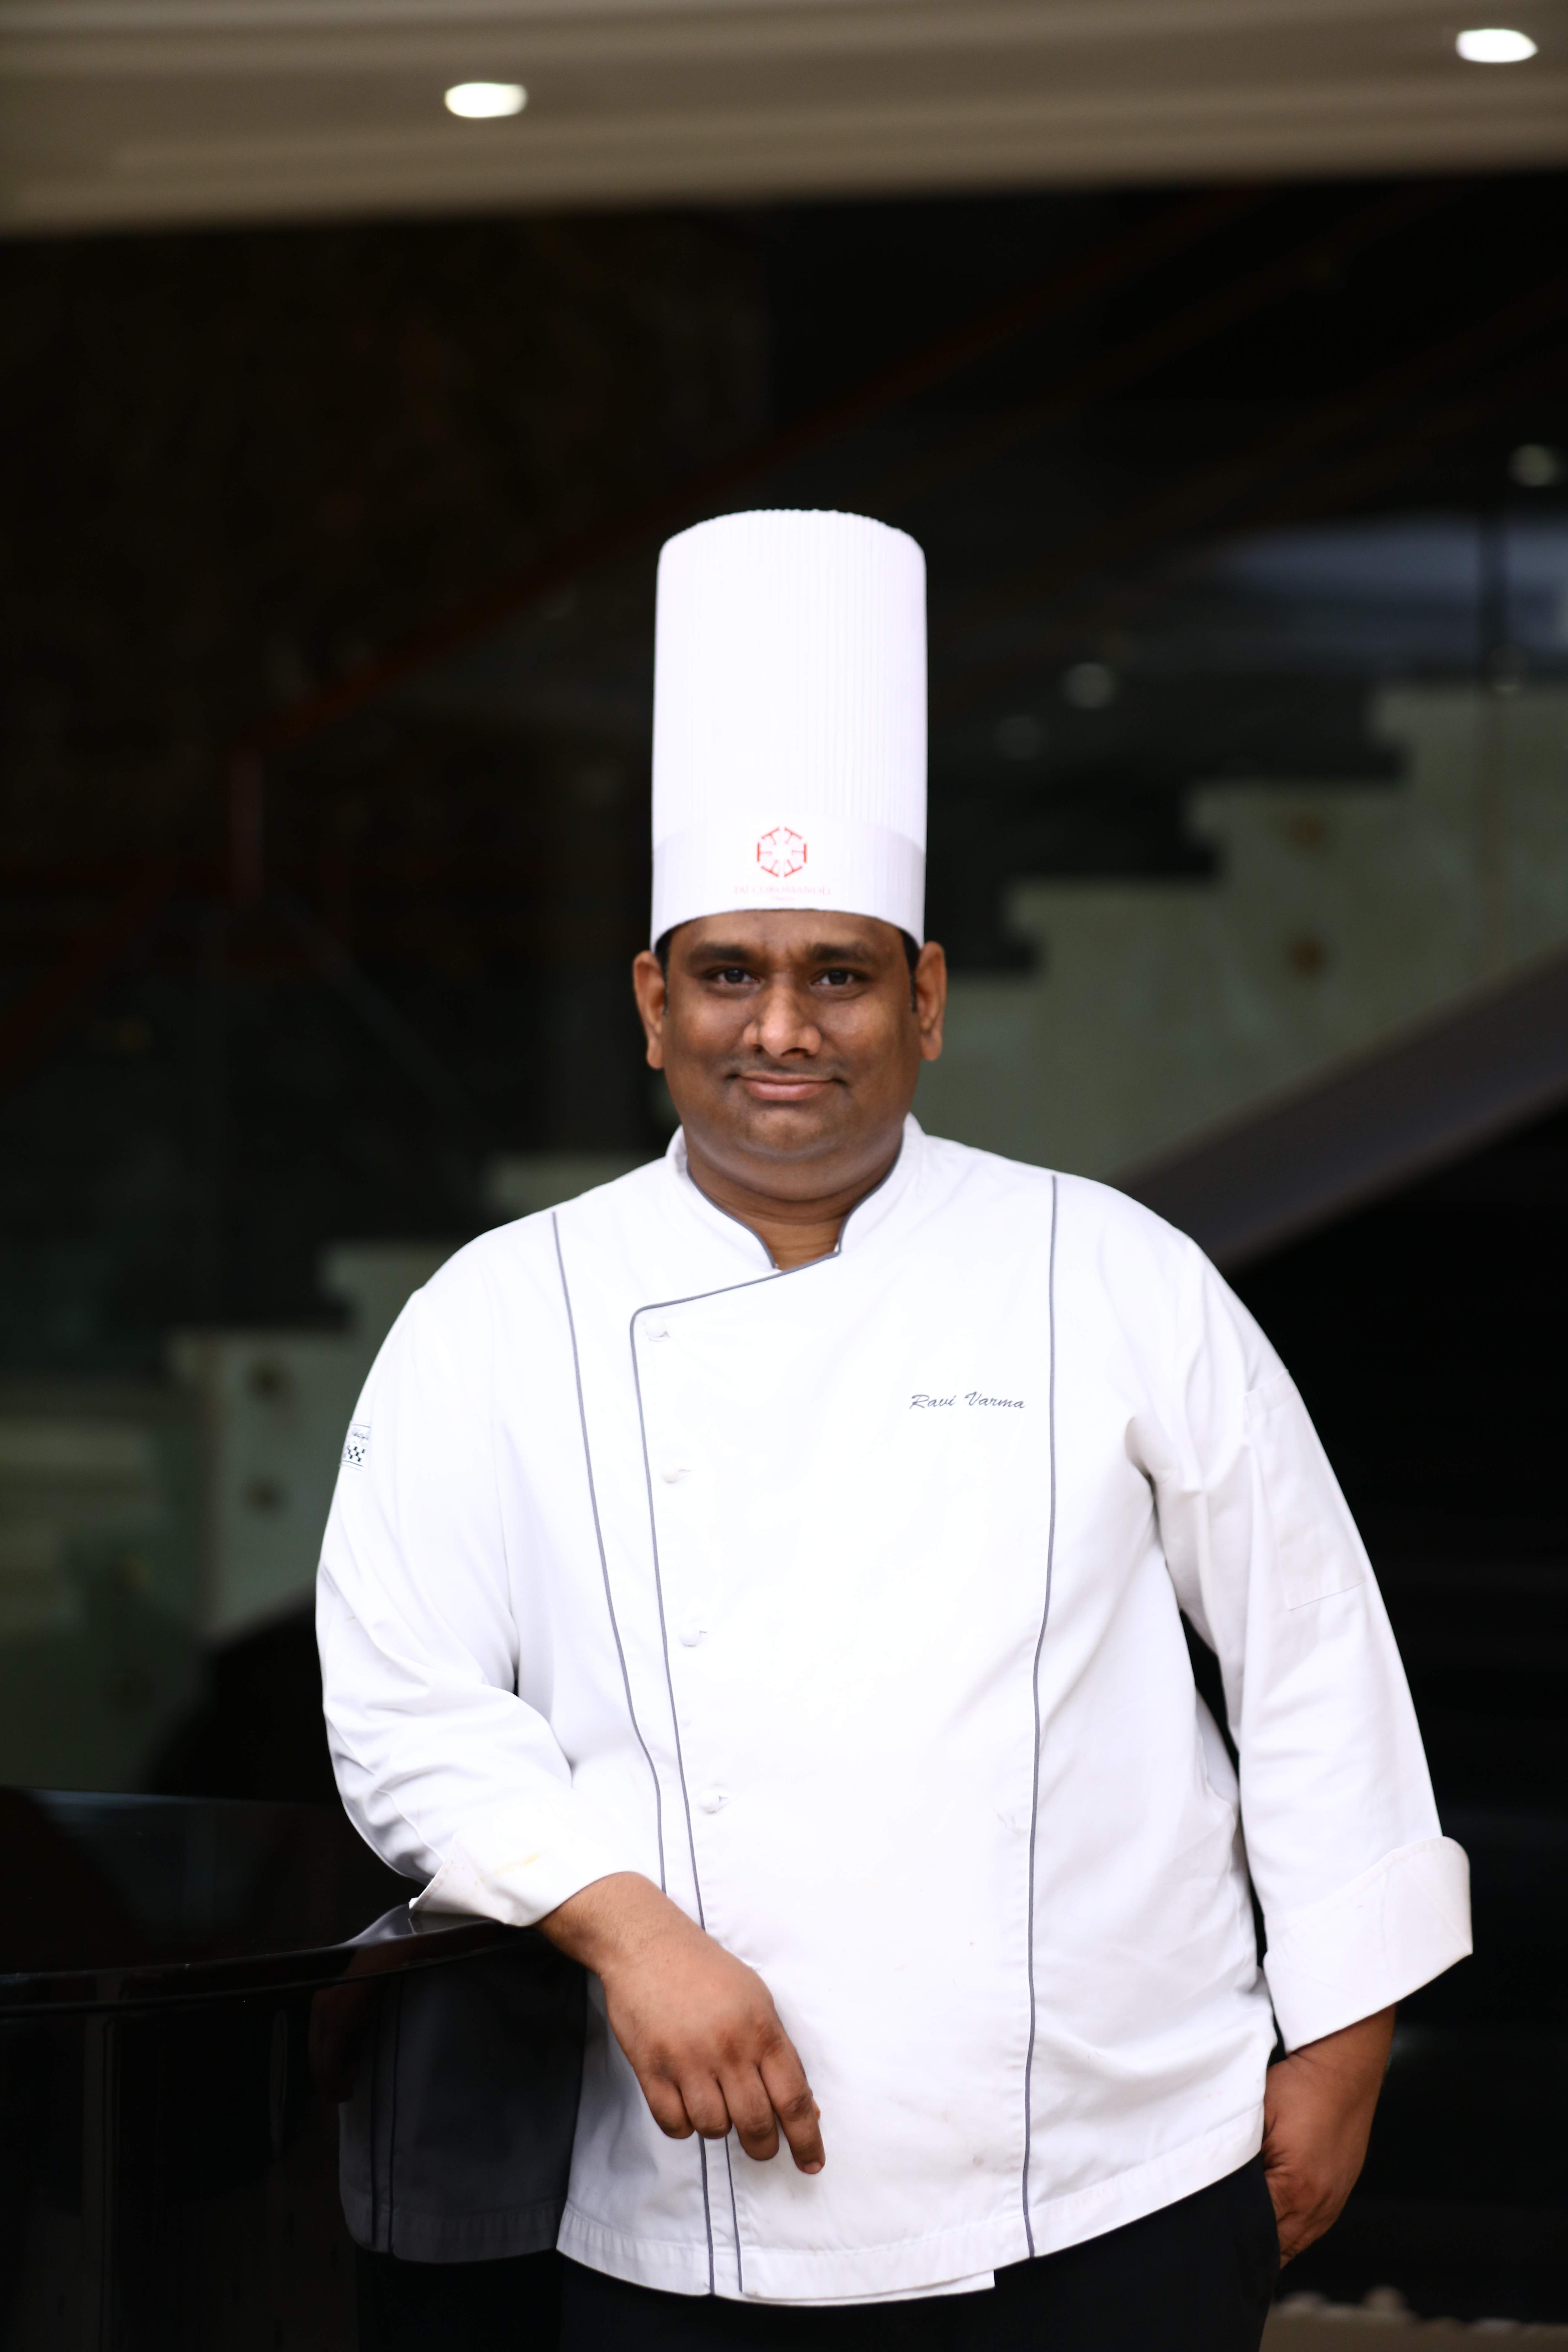 Ravi Varma, Pastry chef,La Patisserie, Taj Coromandel